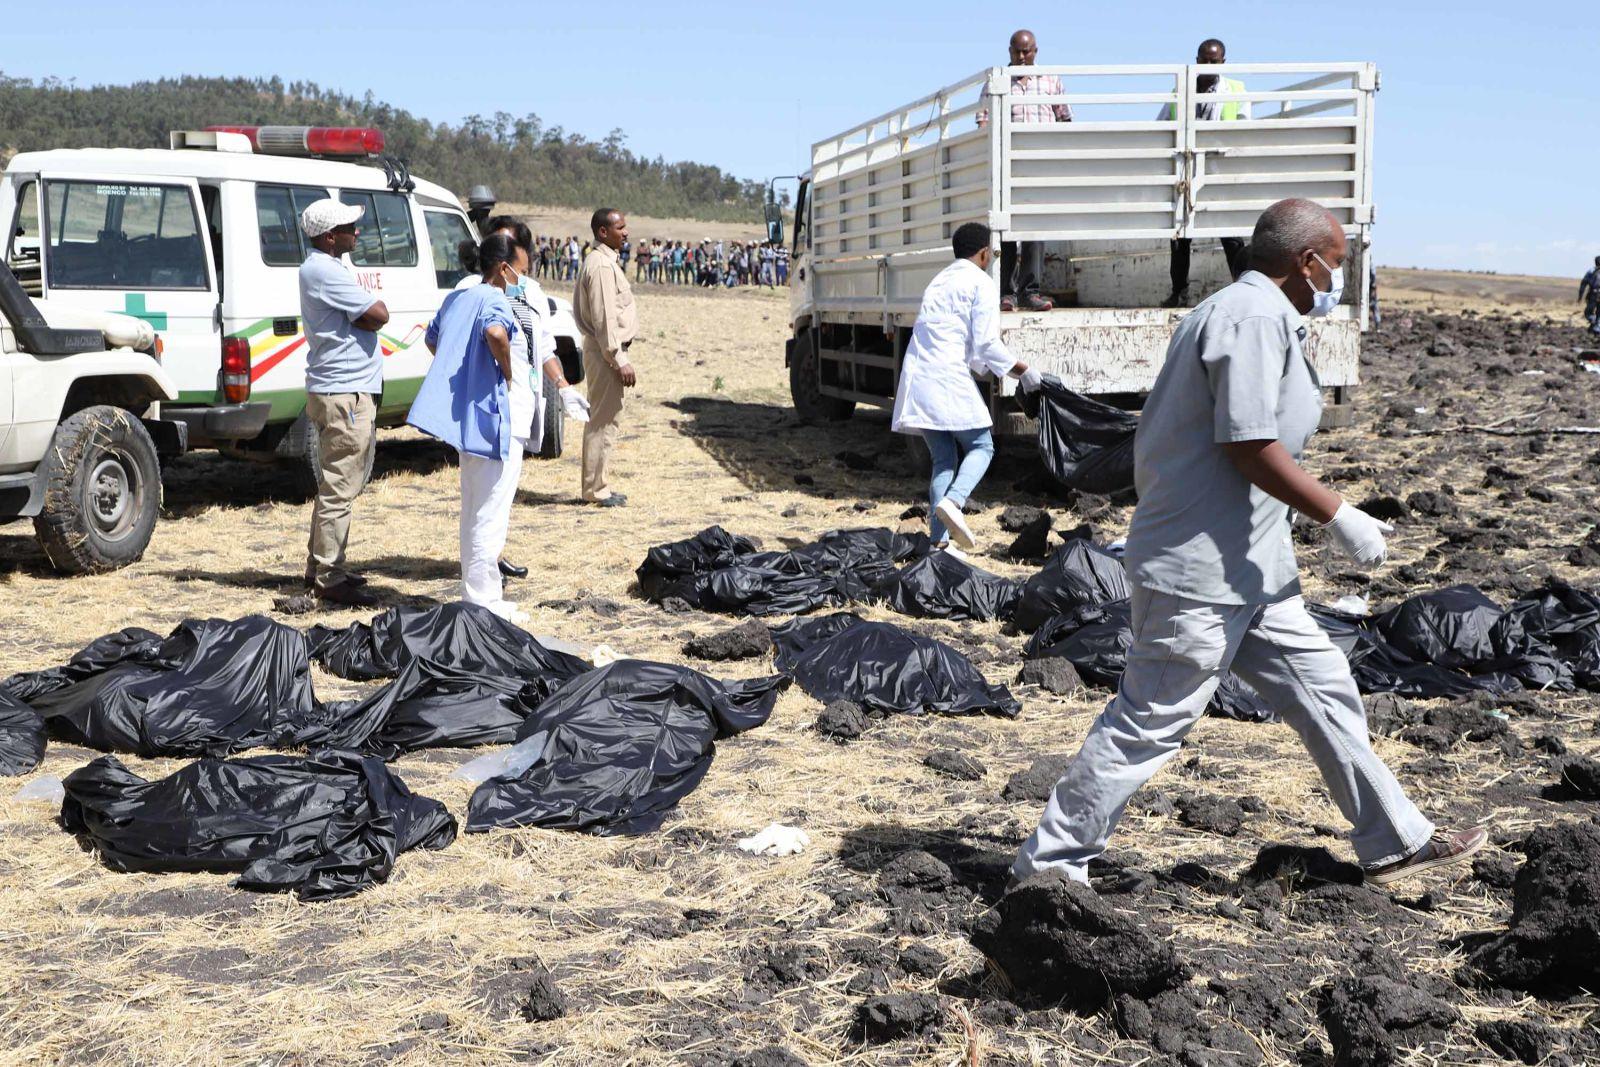 https___cdn.cnn.com_cnnnext_dam_assets_190311132647-14-ethiopia-plane-crash-0310